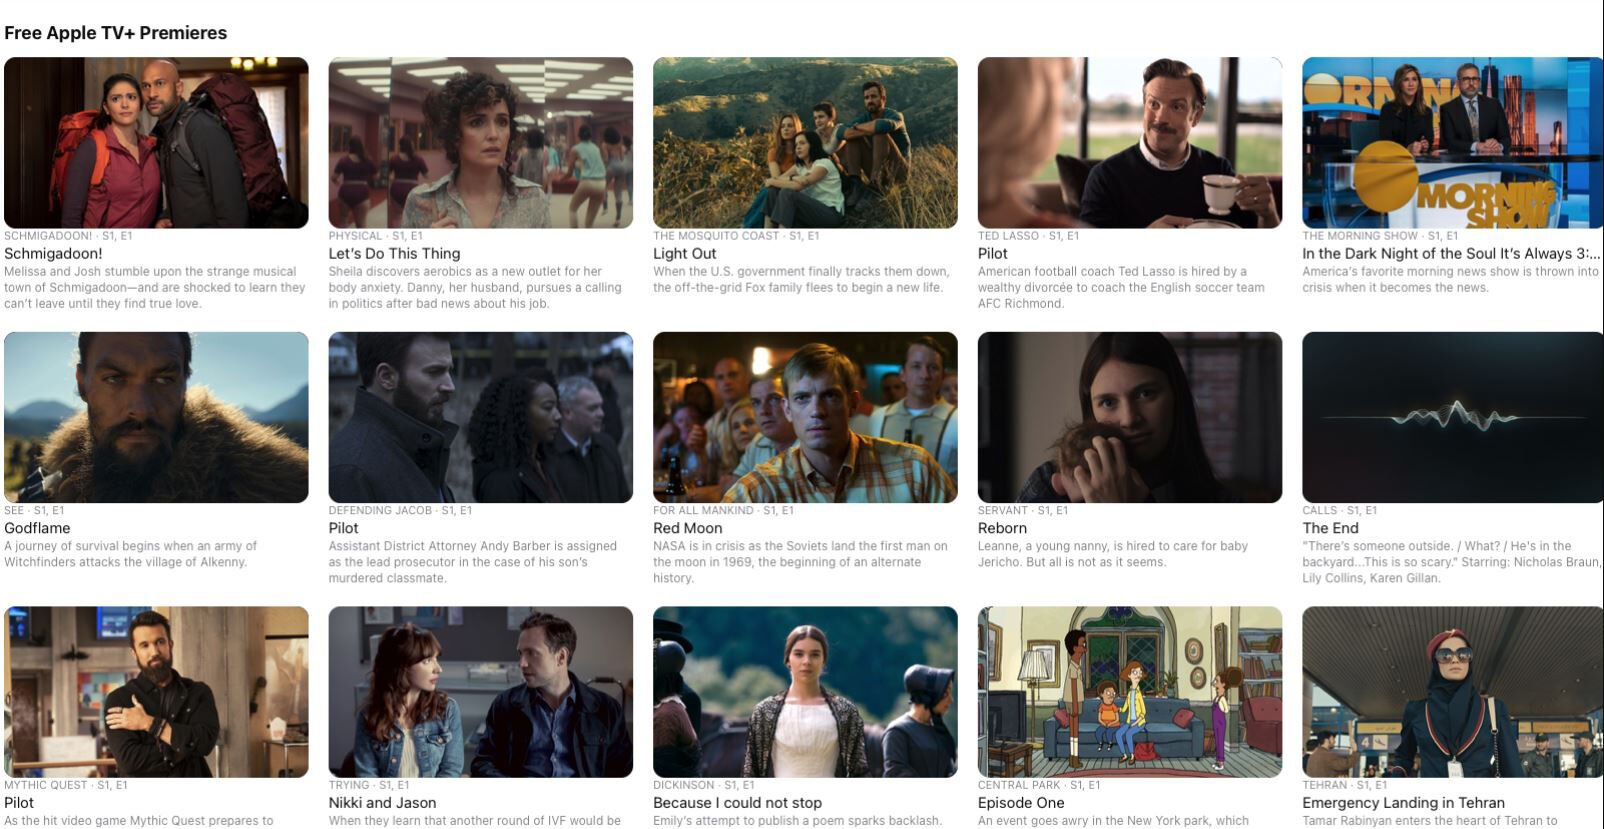 Free Apple TV Shows